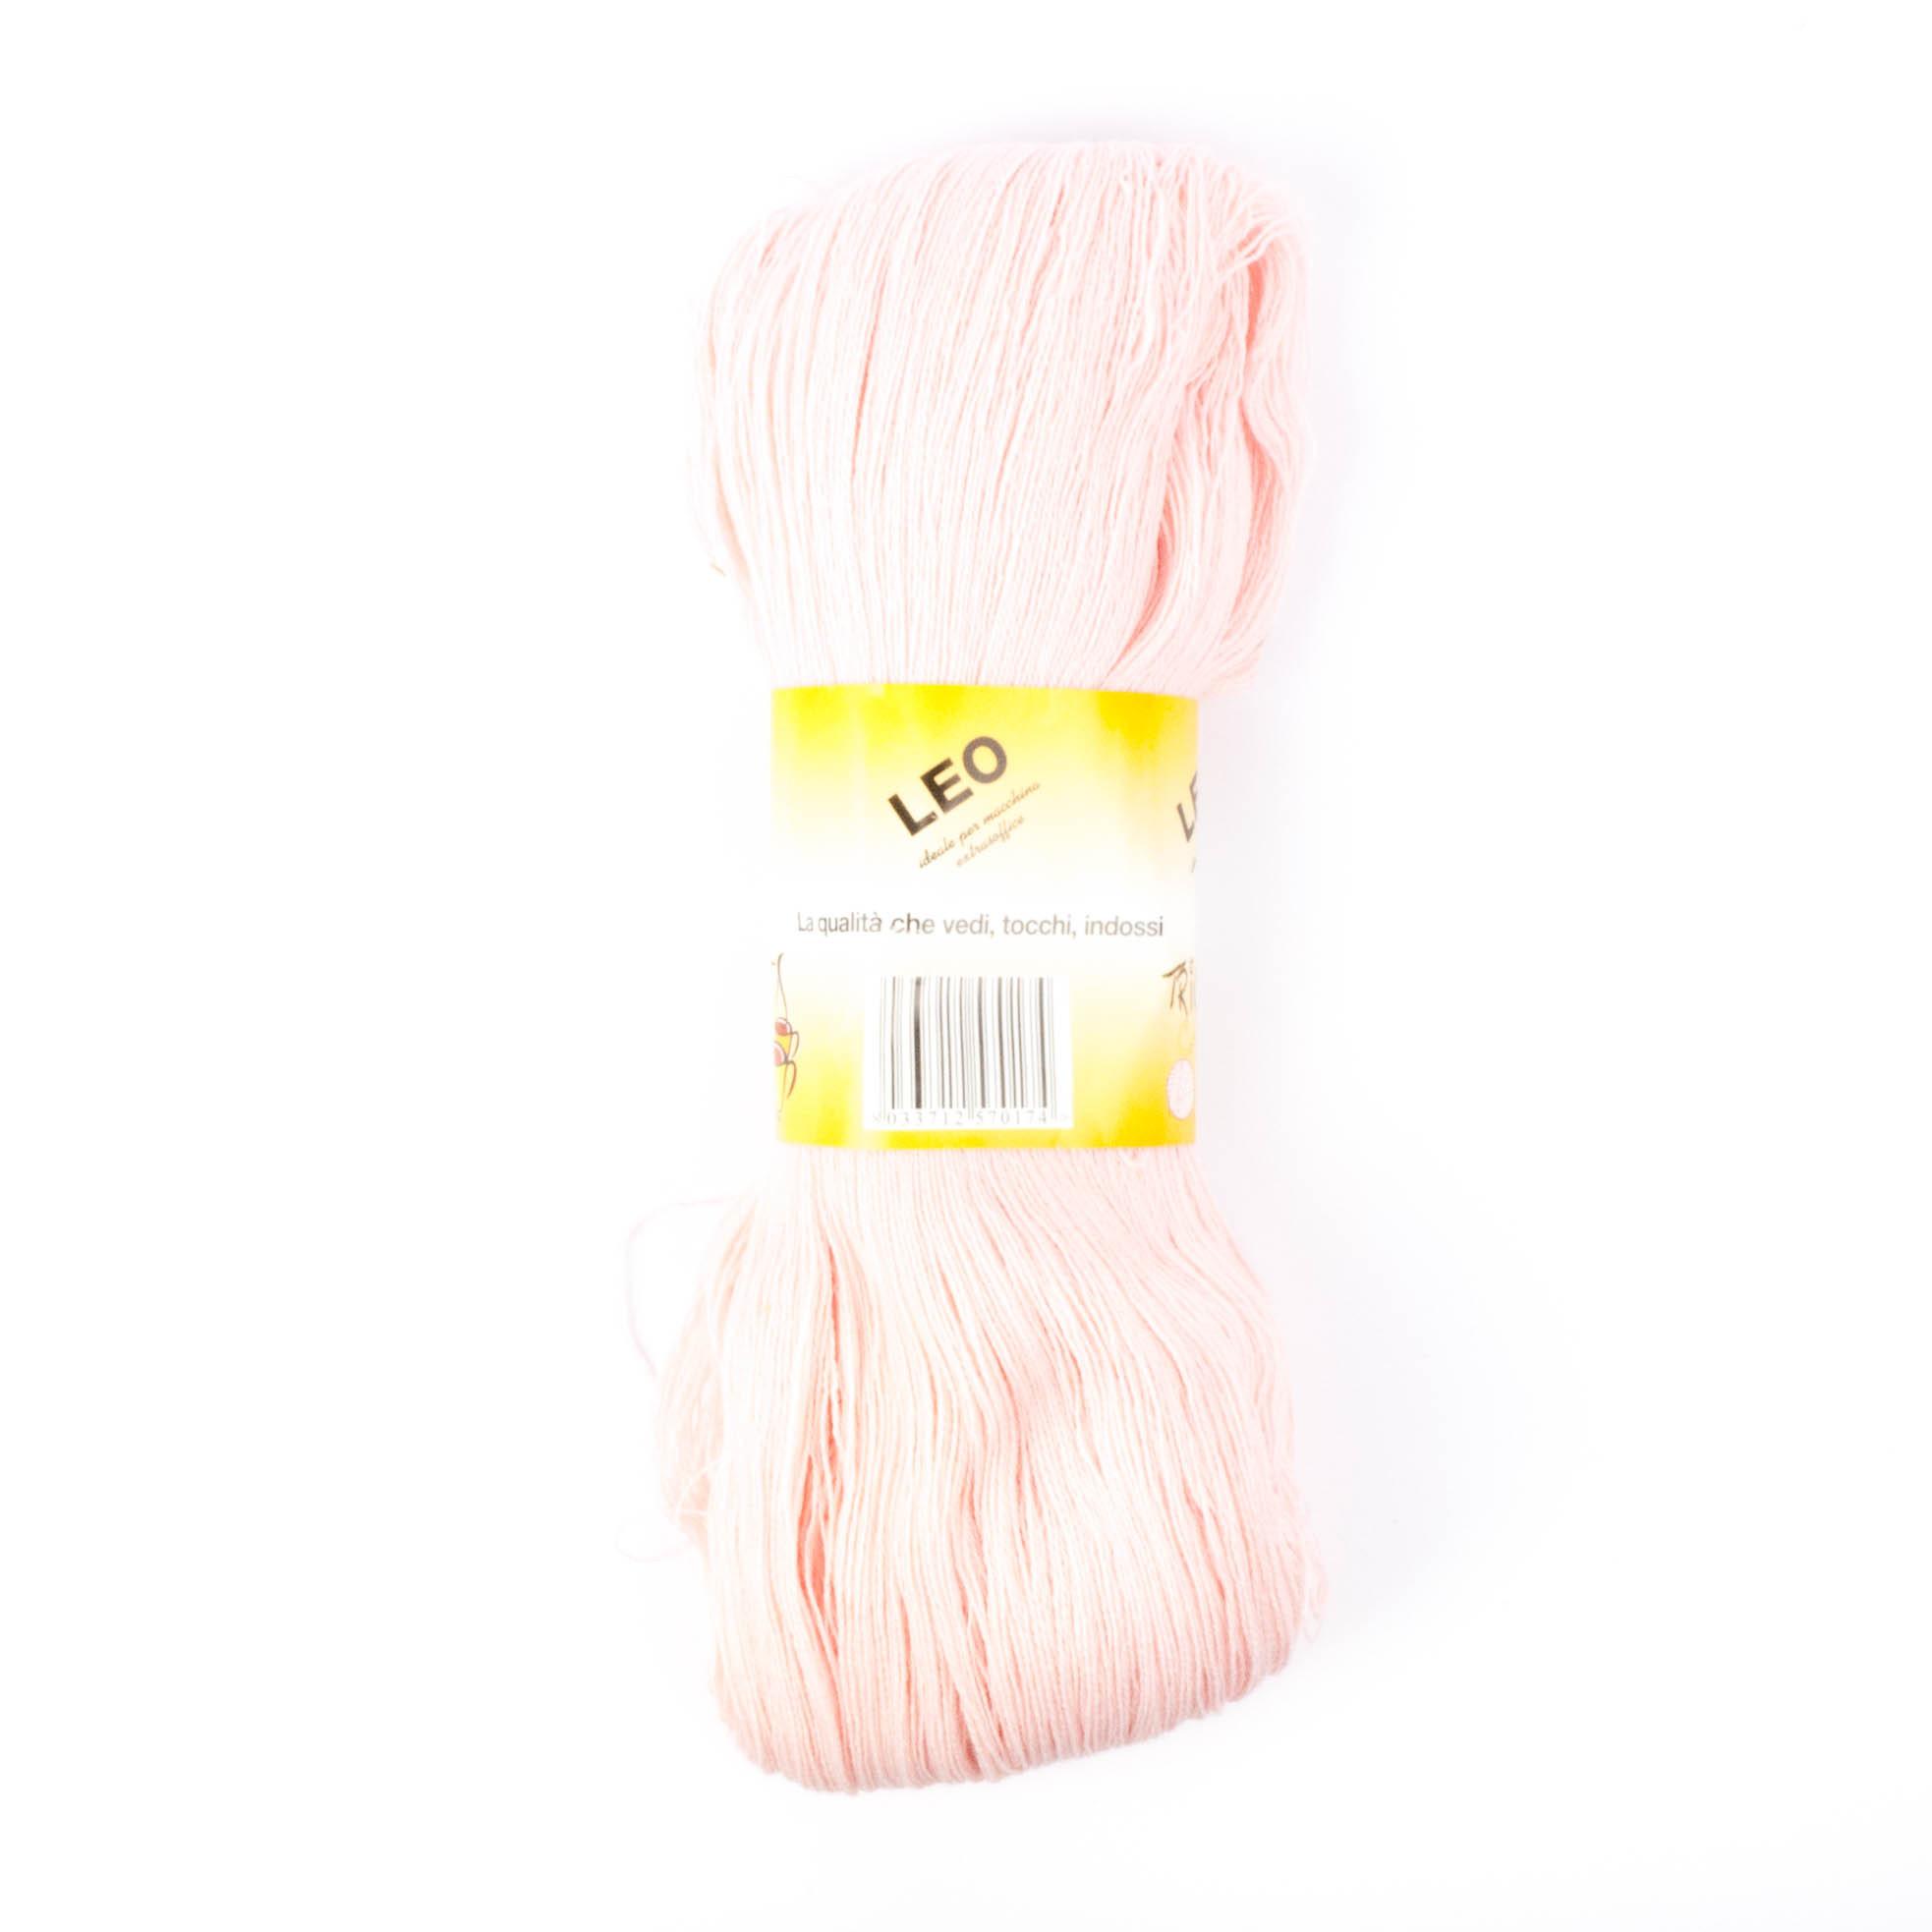 Leo - Matassa misto lana ideale per lavori a mano e macchina - Rosa Baby 45